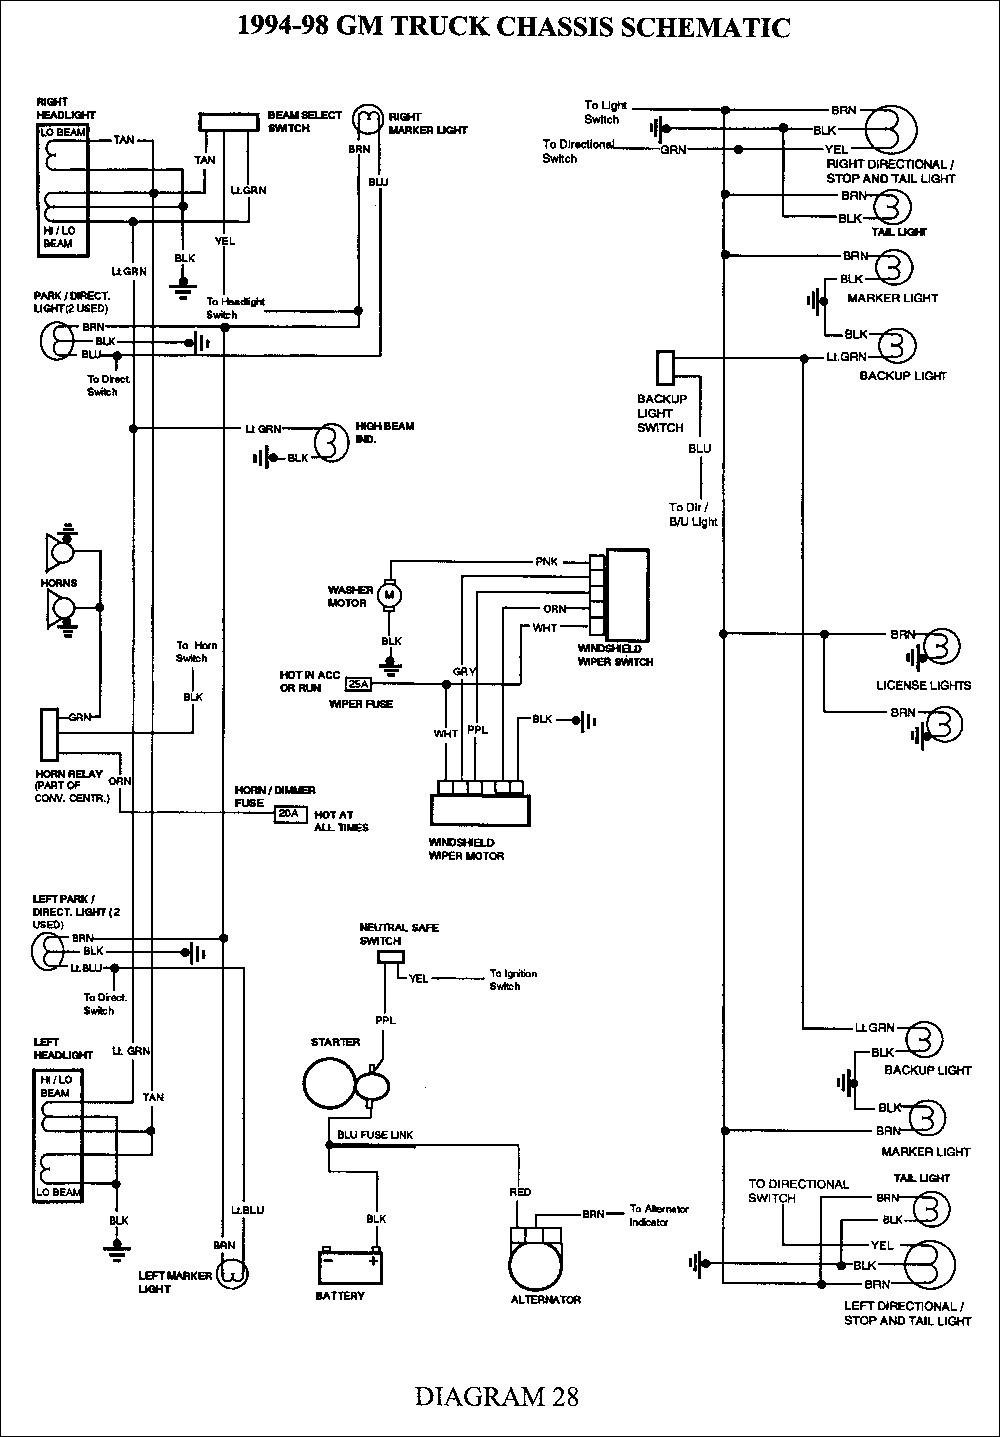 2002 Chevrolet Express 1500 Trailer Wiring | Manual E-Books - 2002 Chevy Silverado Trailer Wiring Diagram